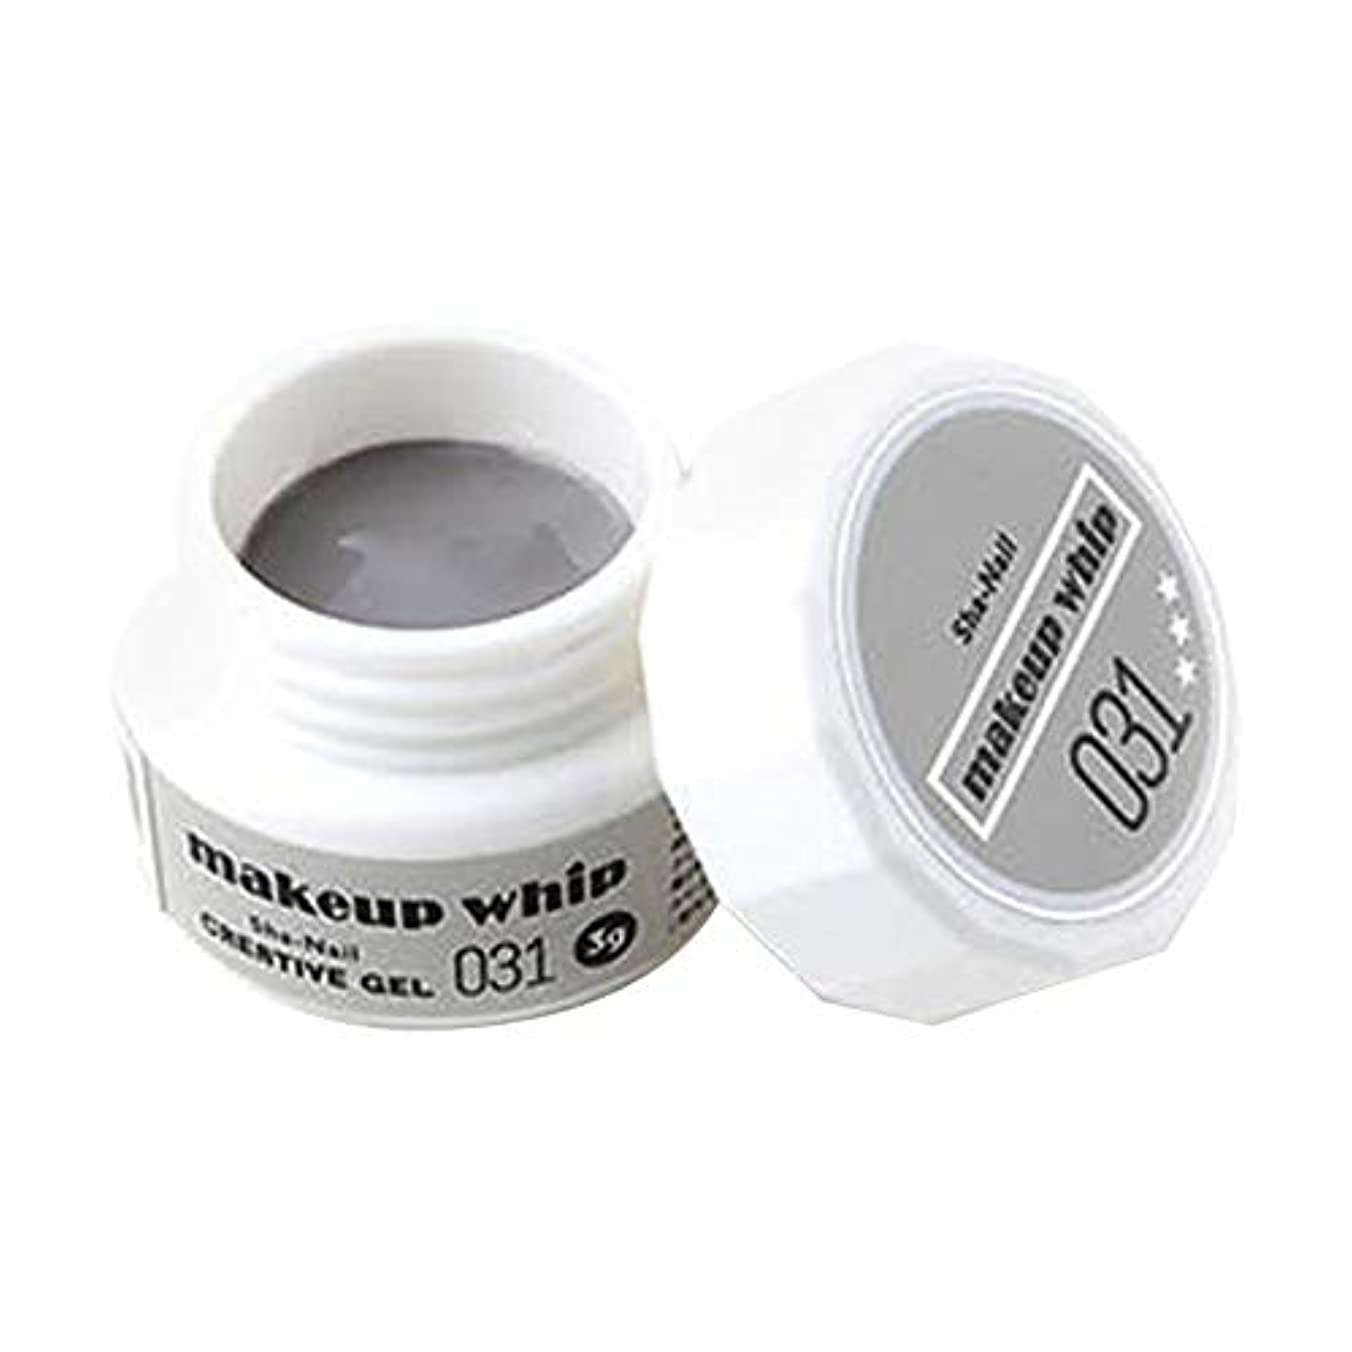 Sha-Nail Creative Gel メイクアップホイップカラー 031 マット 3g UV/LED対応